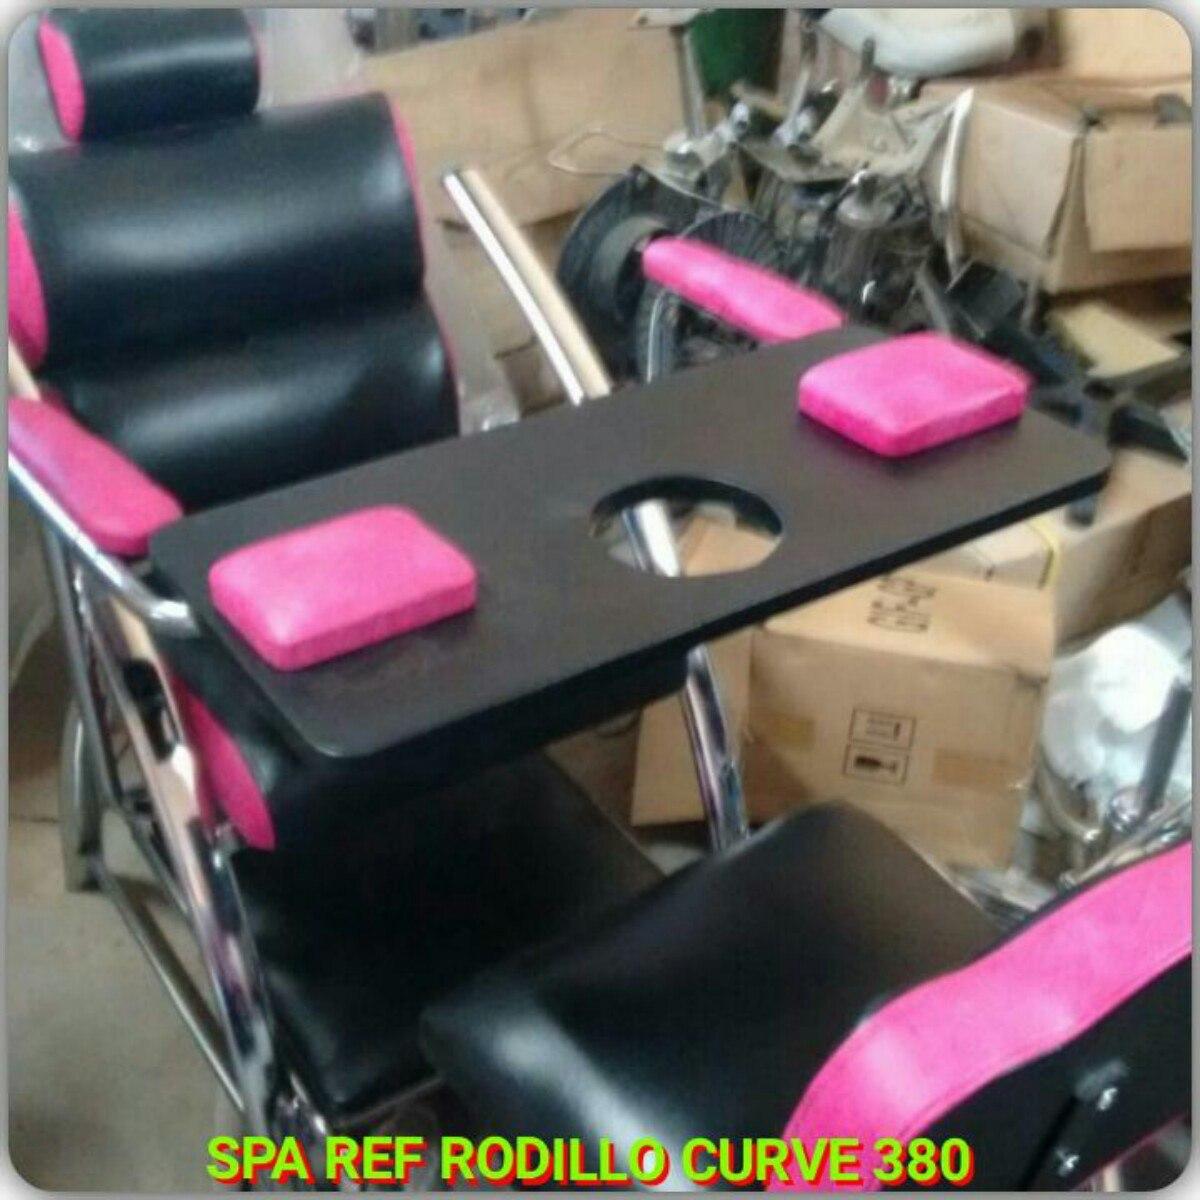 Muebles peluqueria spa de u as manicure y pedicure 350 for Sillas para manicure y pedicure bogota